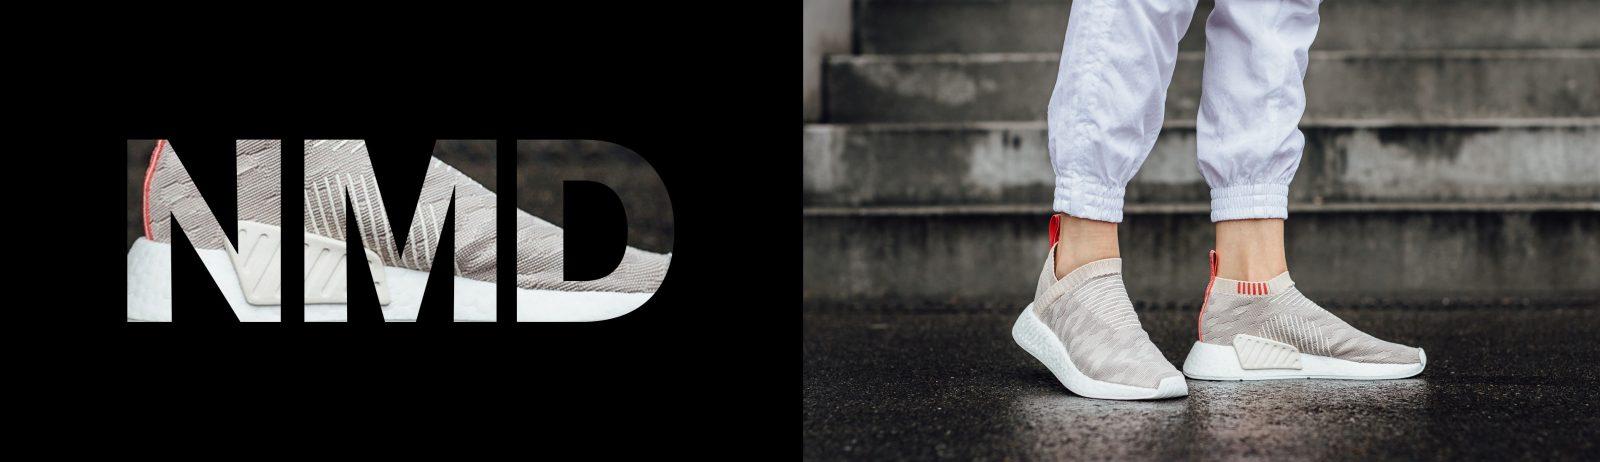 Women's Adidas NMD Trainers